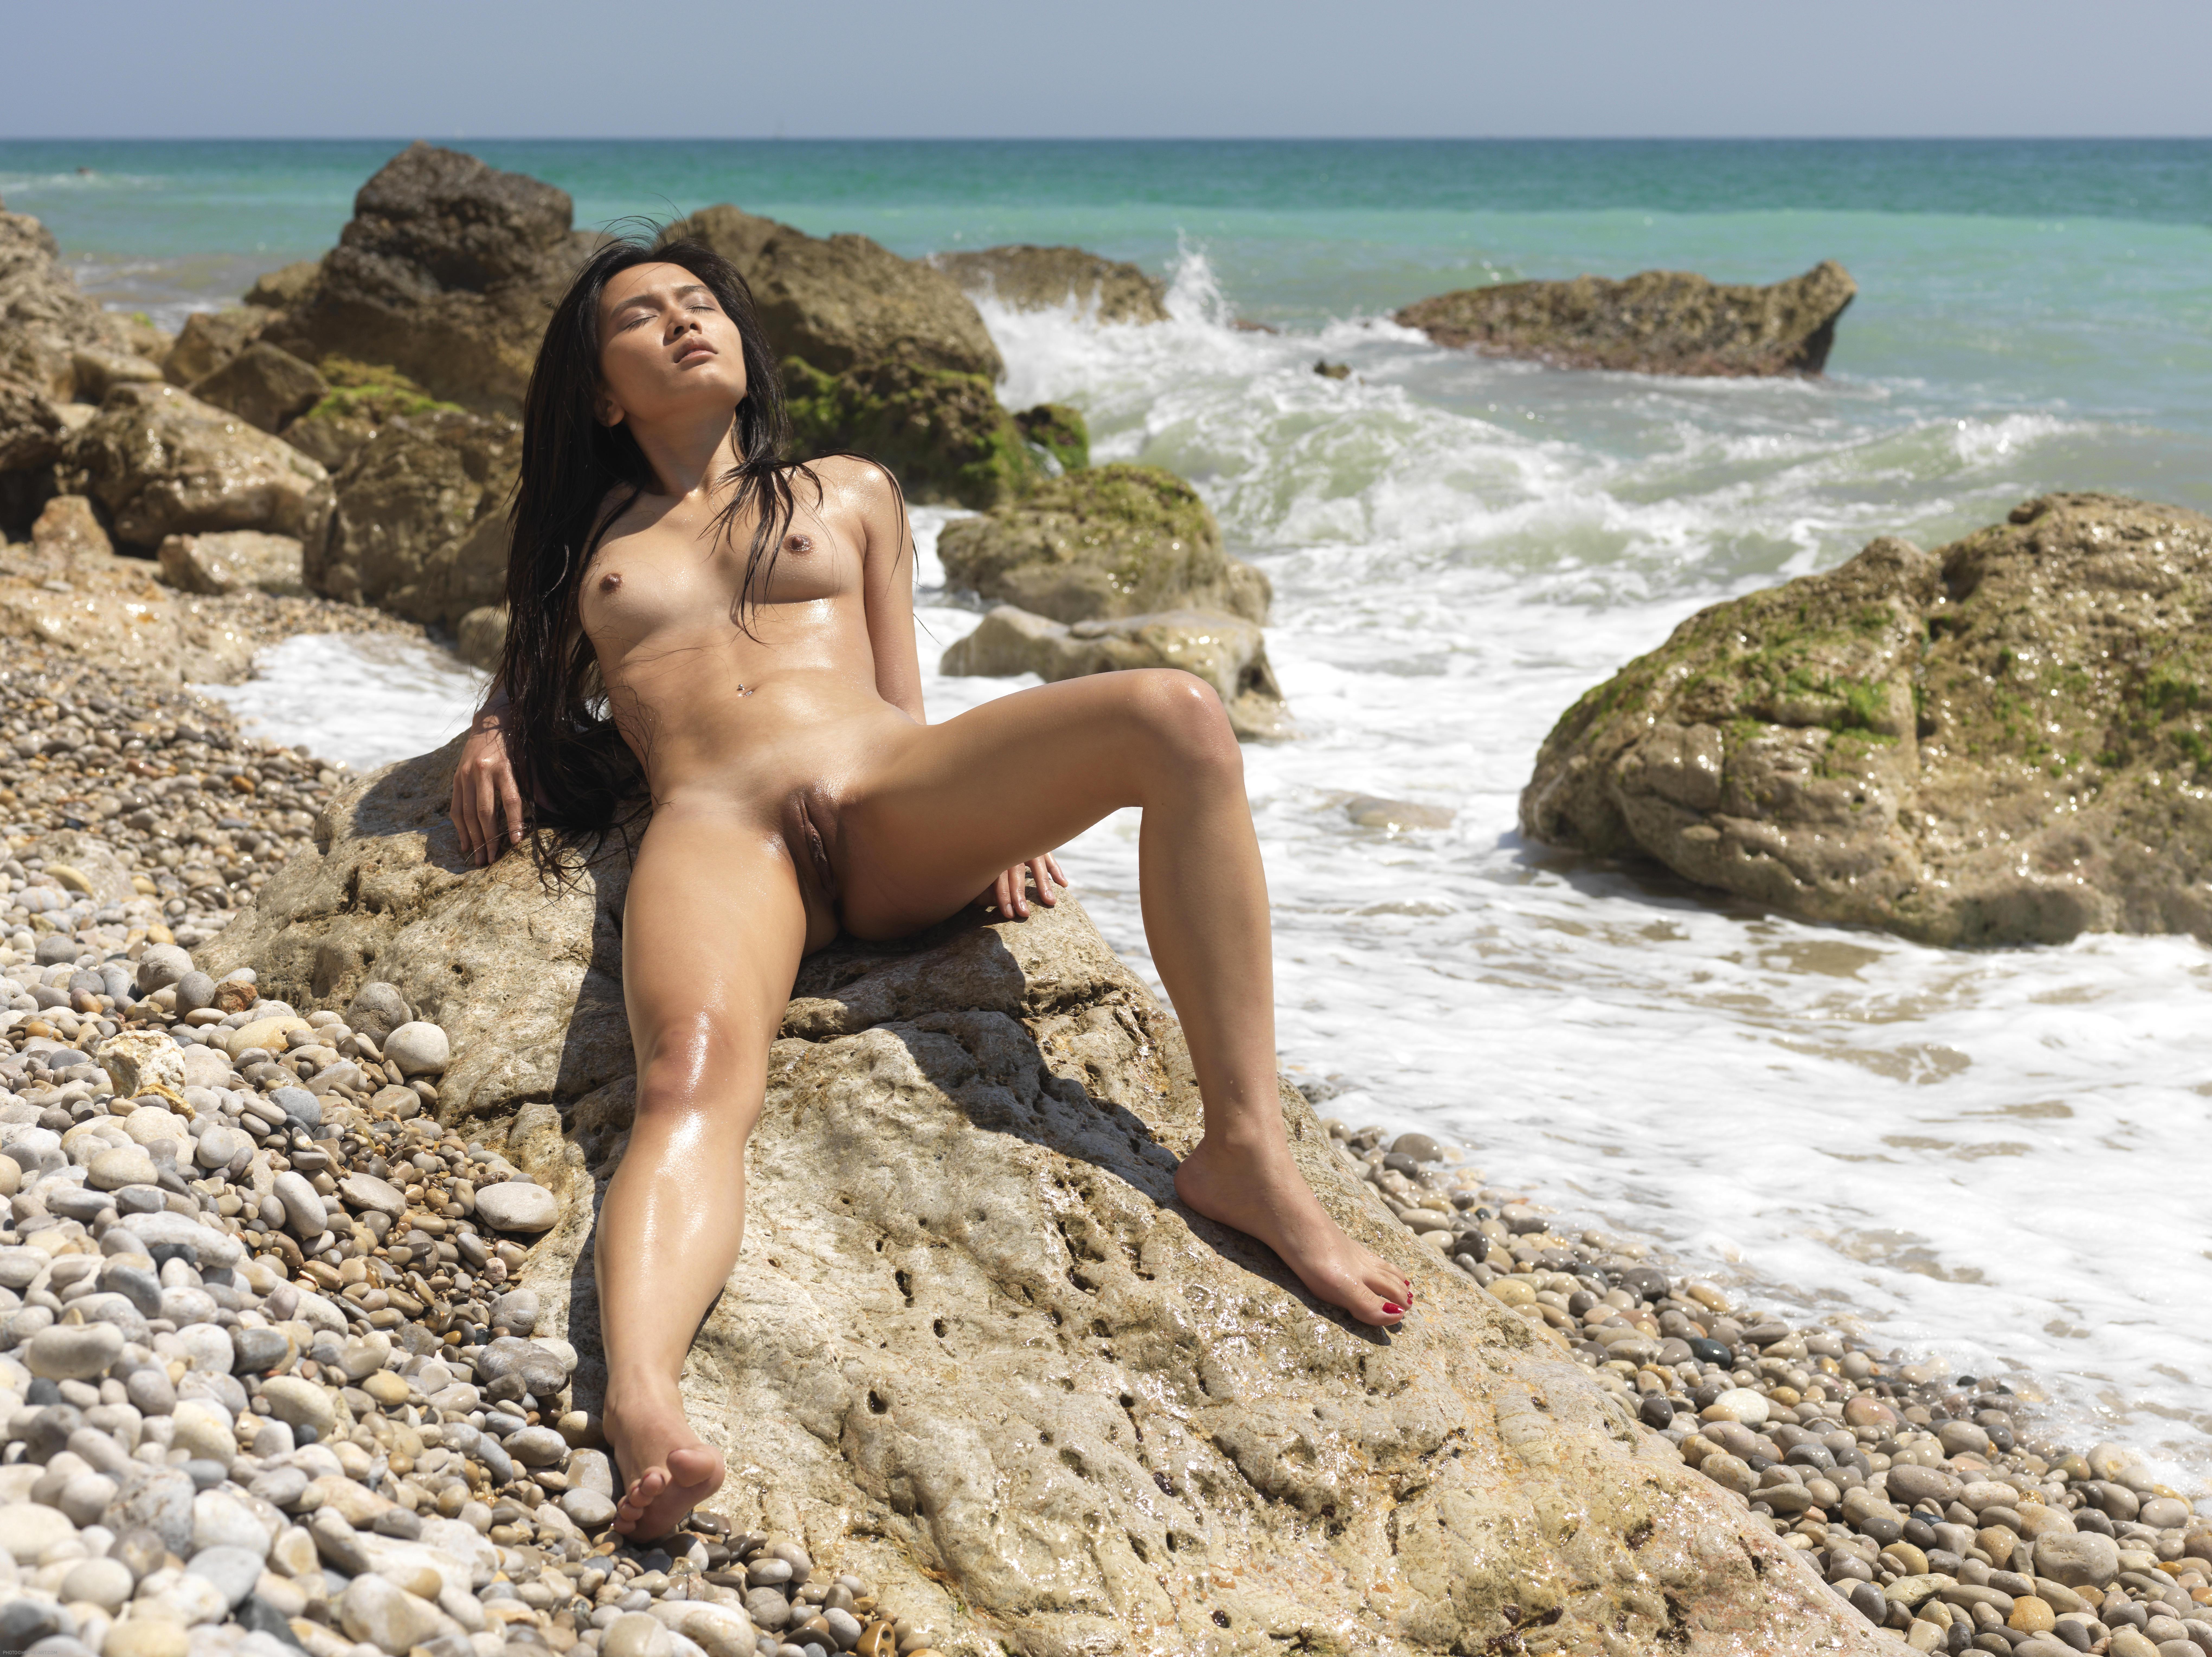 adult beaches mexico